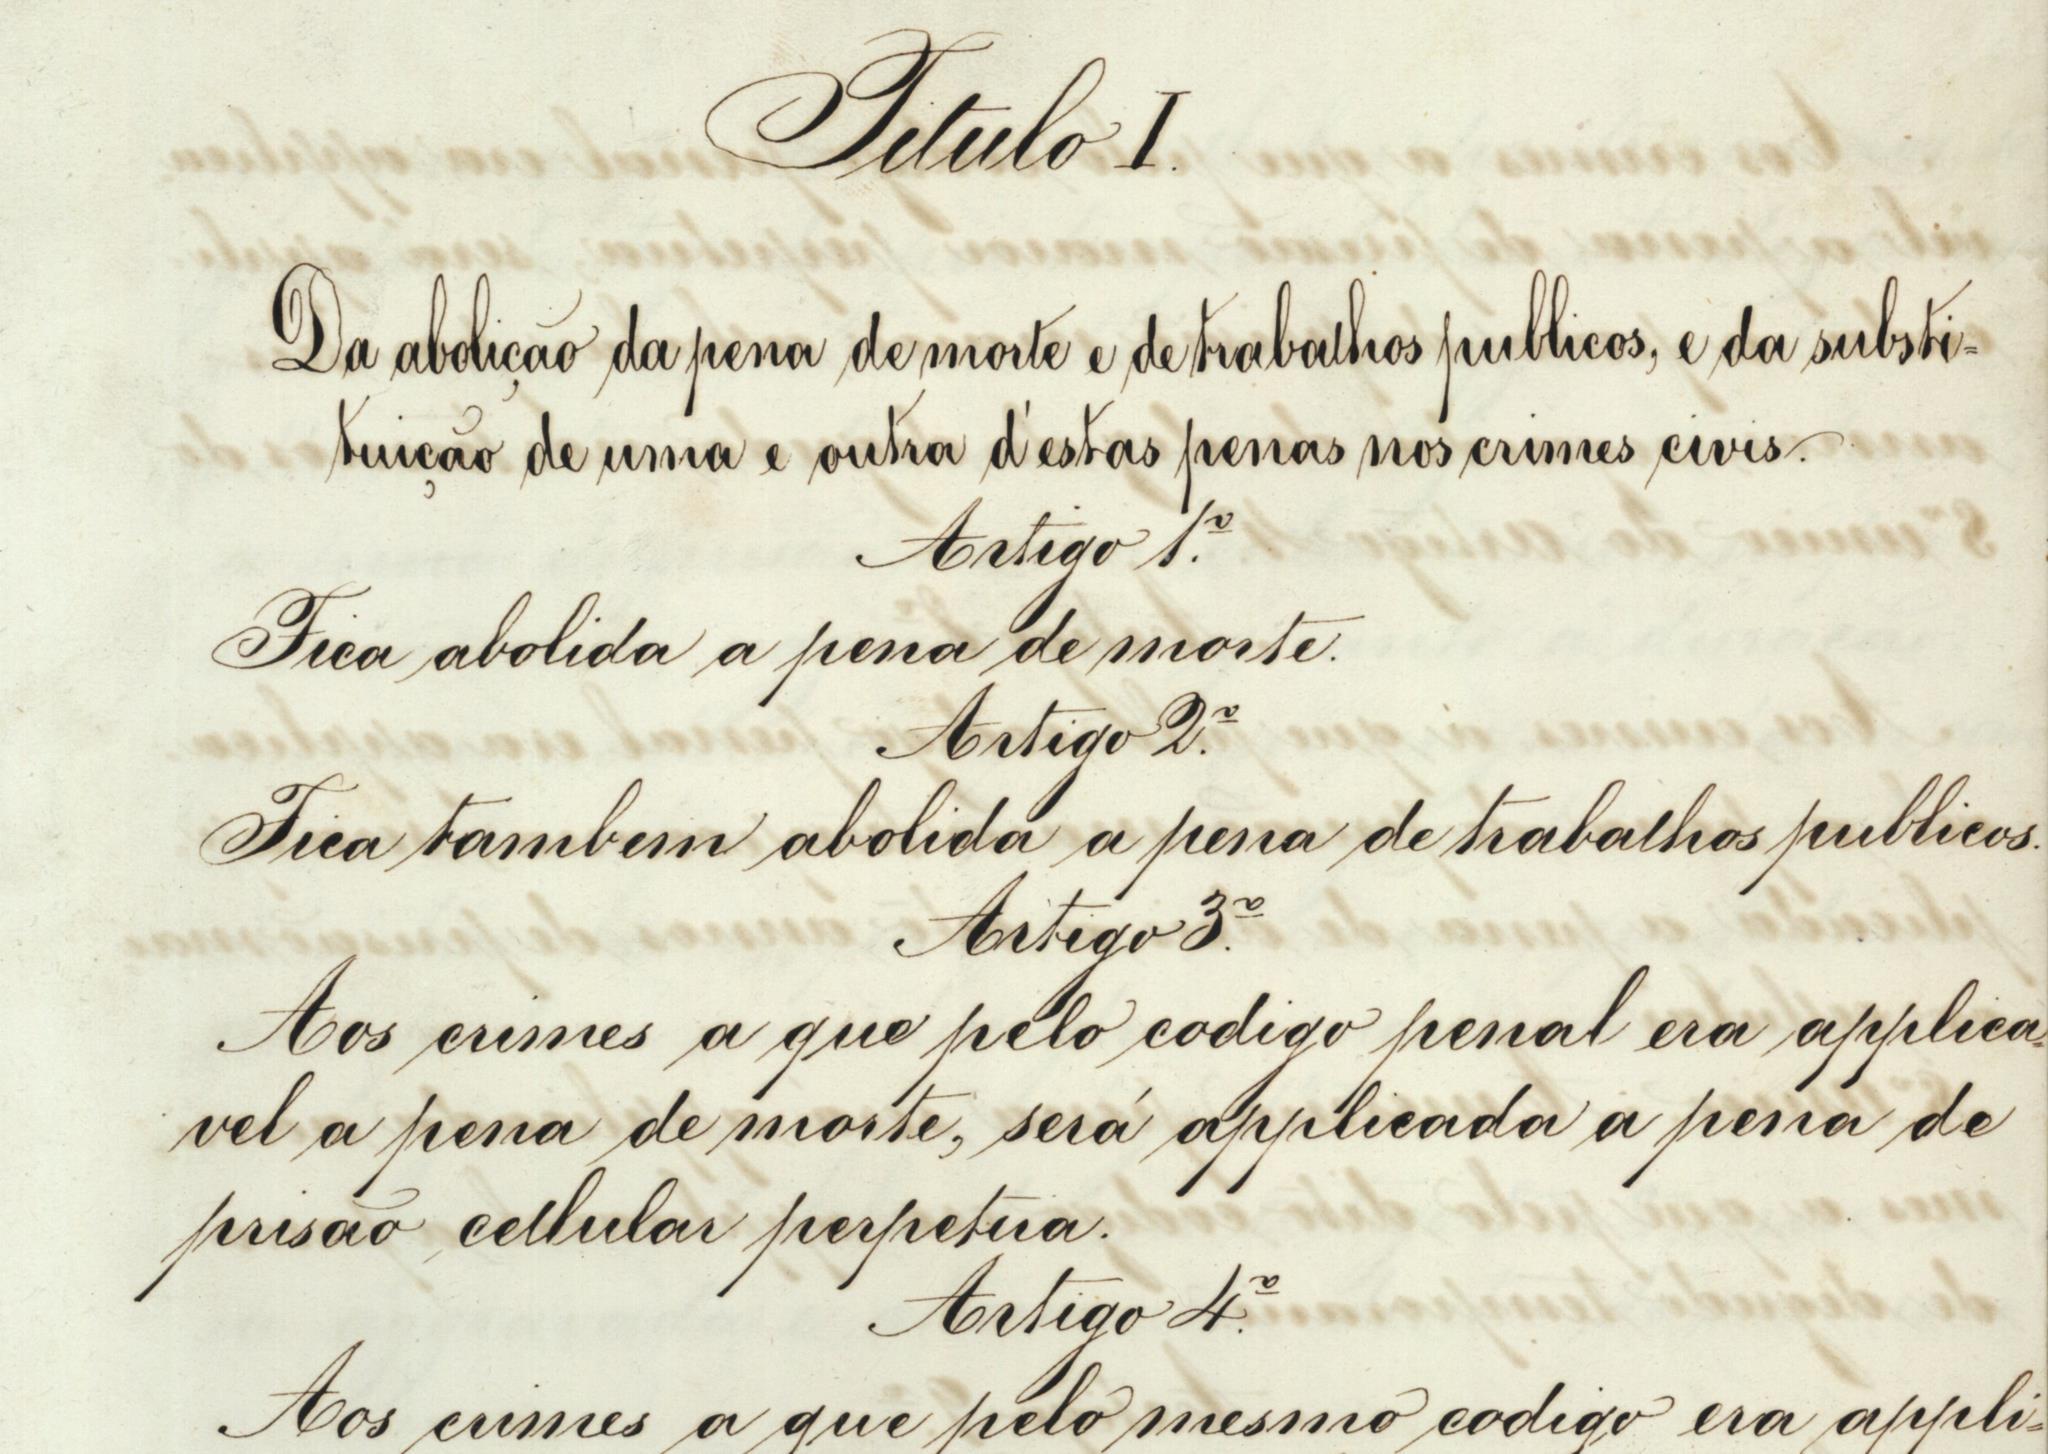 PÚBLICO - Há 150 anos, Portugal dava o exemplo que a Europa iria imitar